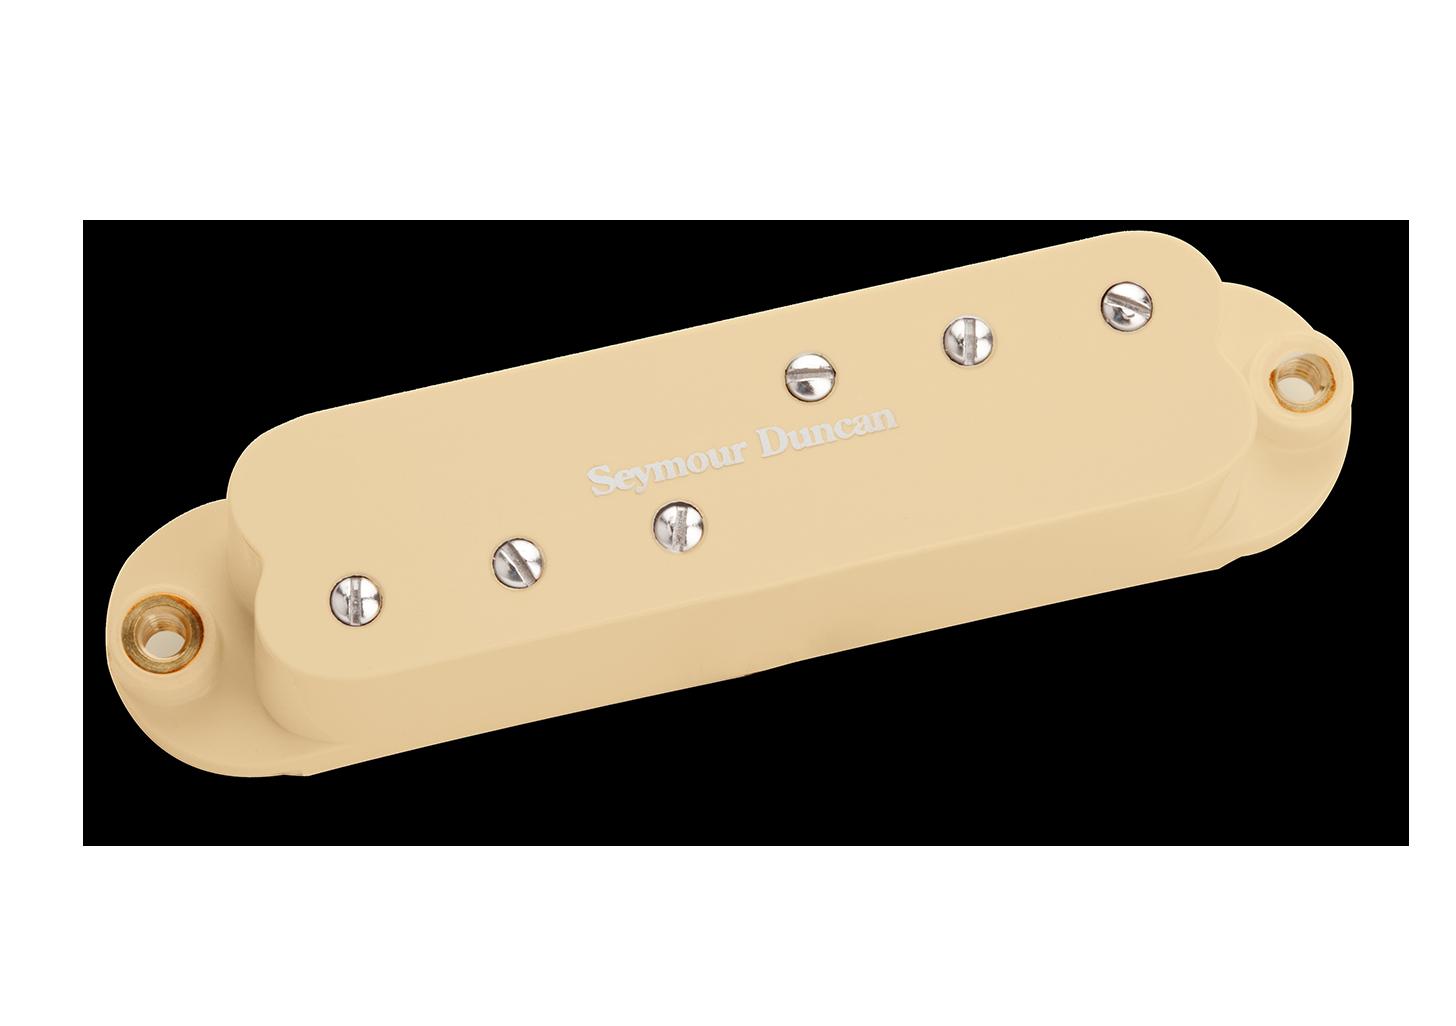 Seymour Duncan Duckbuckers Strat SDBR-1B - Bridge Cream